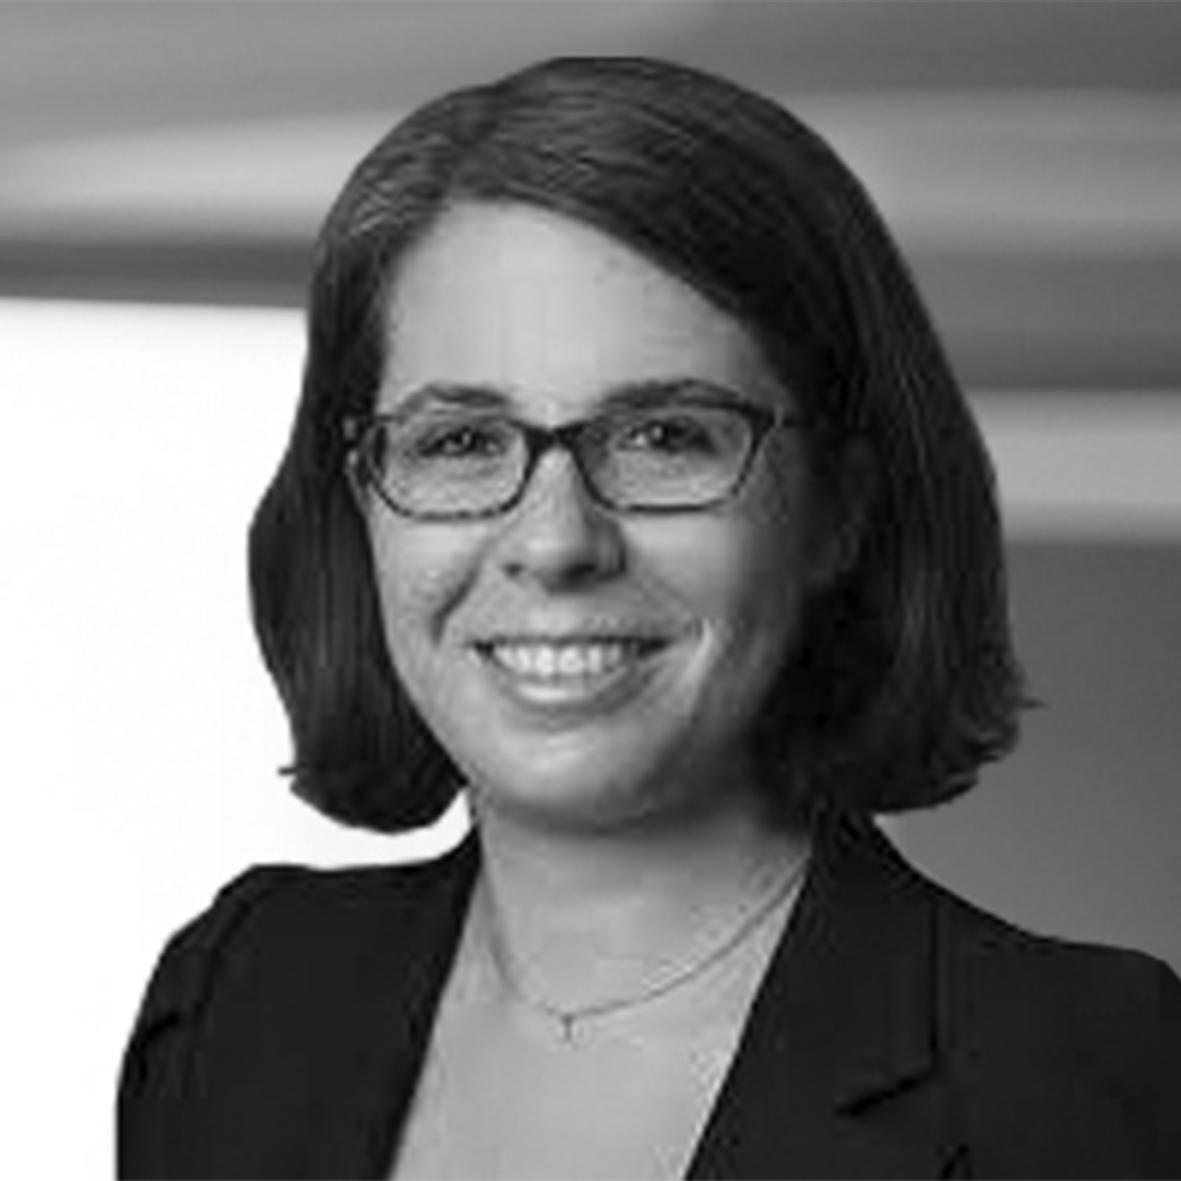 The speaker Geraldine Scali, 's profile image